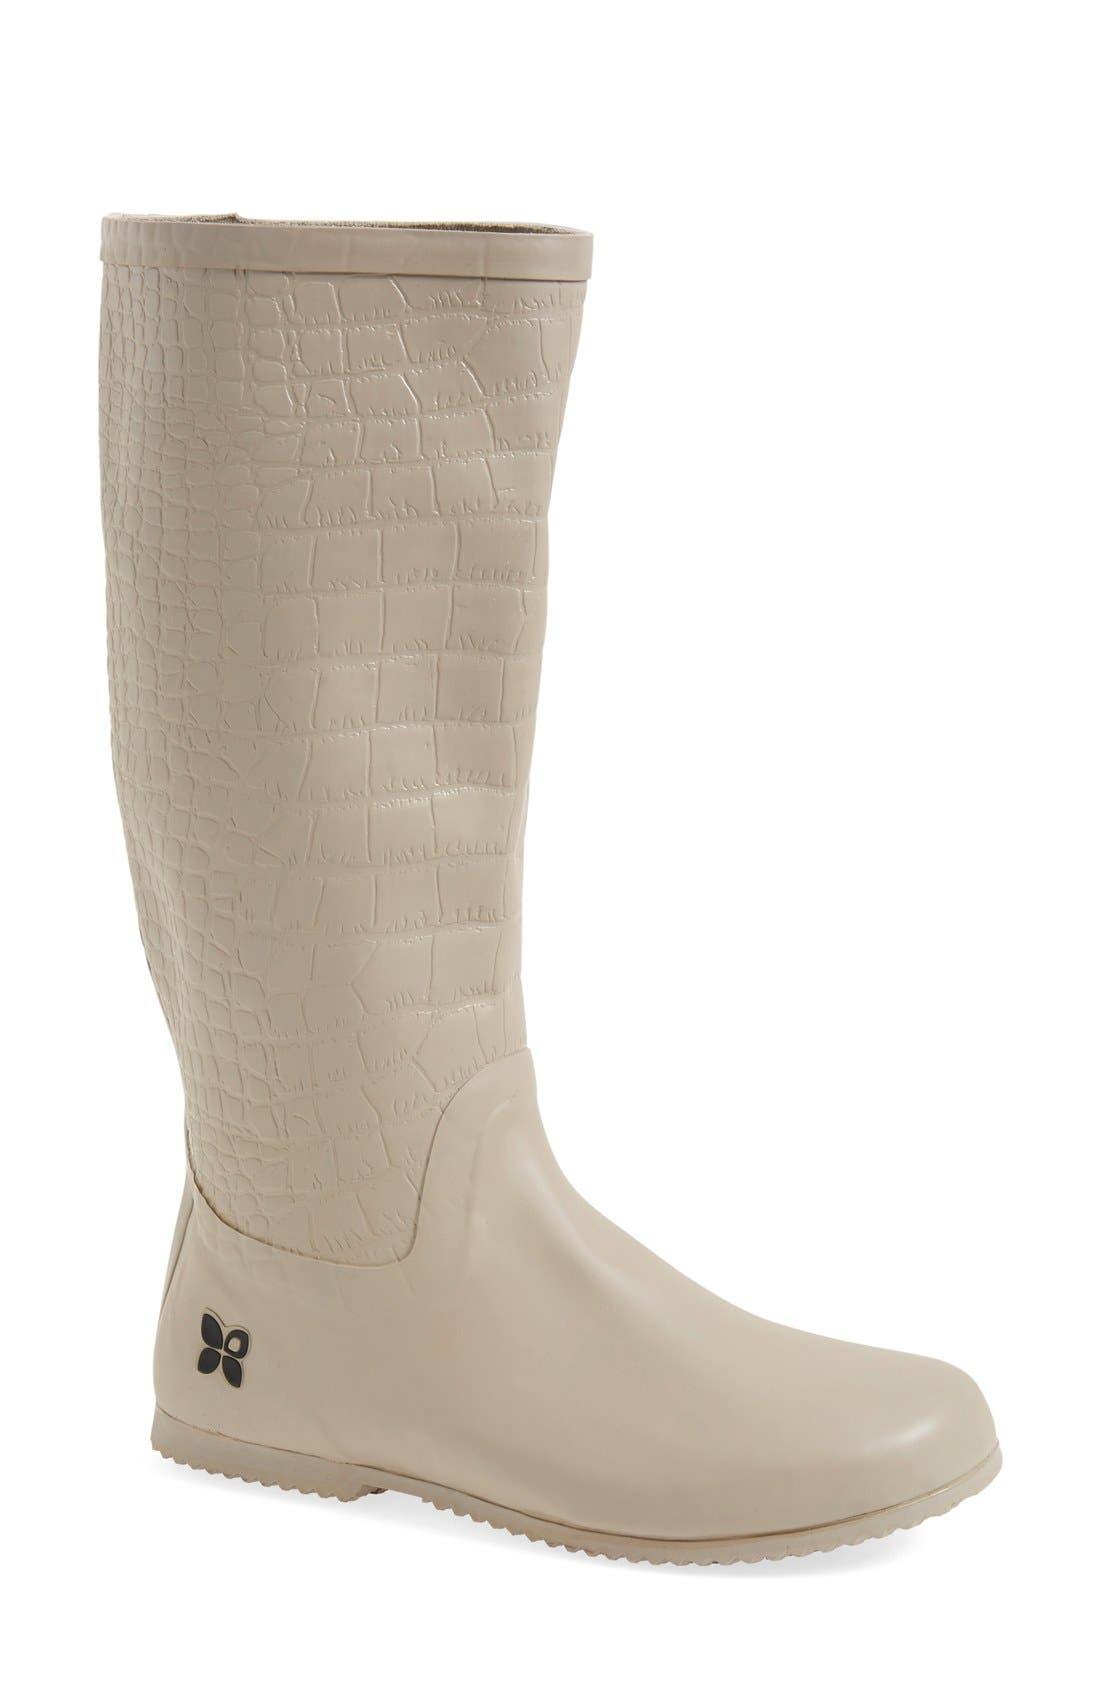 Main Image - Butterfly Twists 'Carlisle' Foldable Rain Boot (Women)